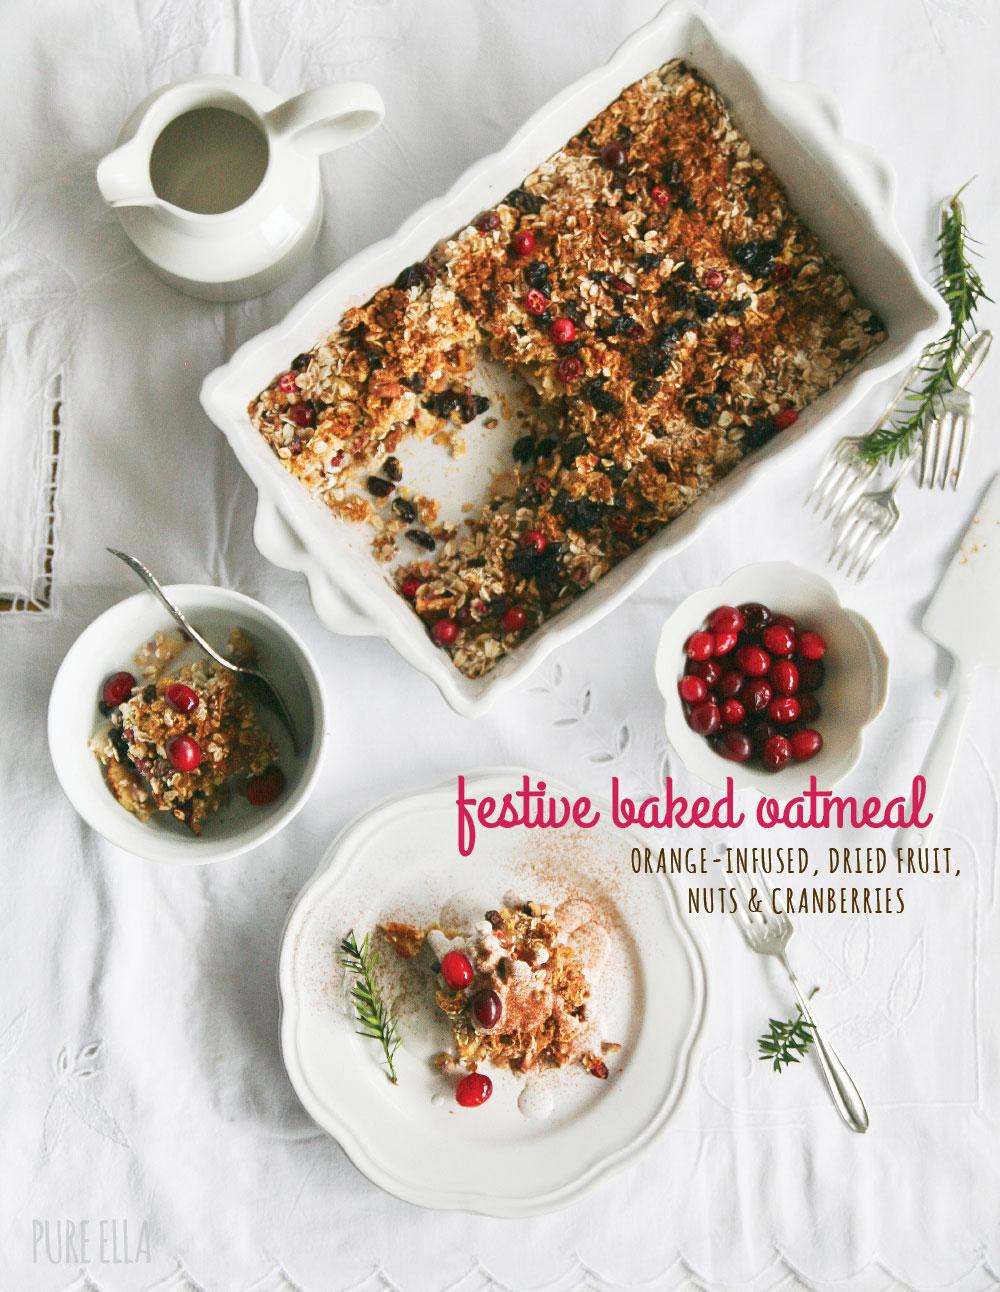 Gluten-free-Vegan-Festive-Baked-Oatmeal